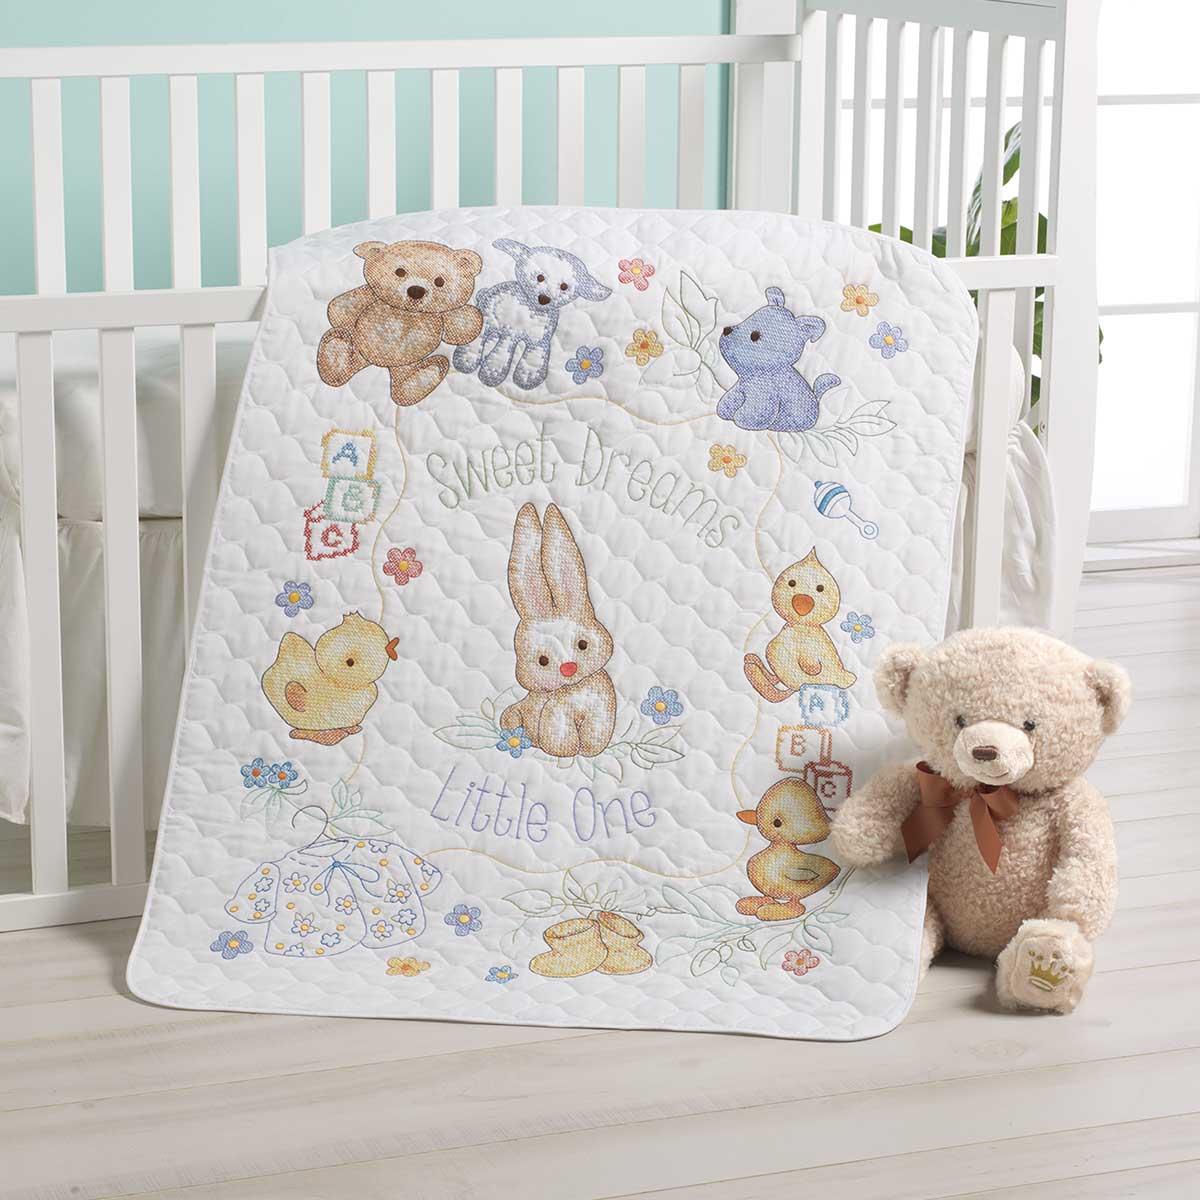 Bucilla ® Baby - Stamped Cross Stitch - Crib Ensembles - Hallmark - Playful Pals - Crib Cover